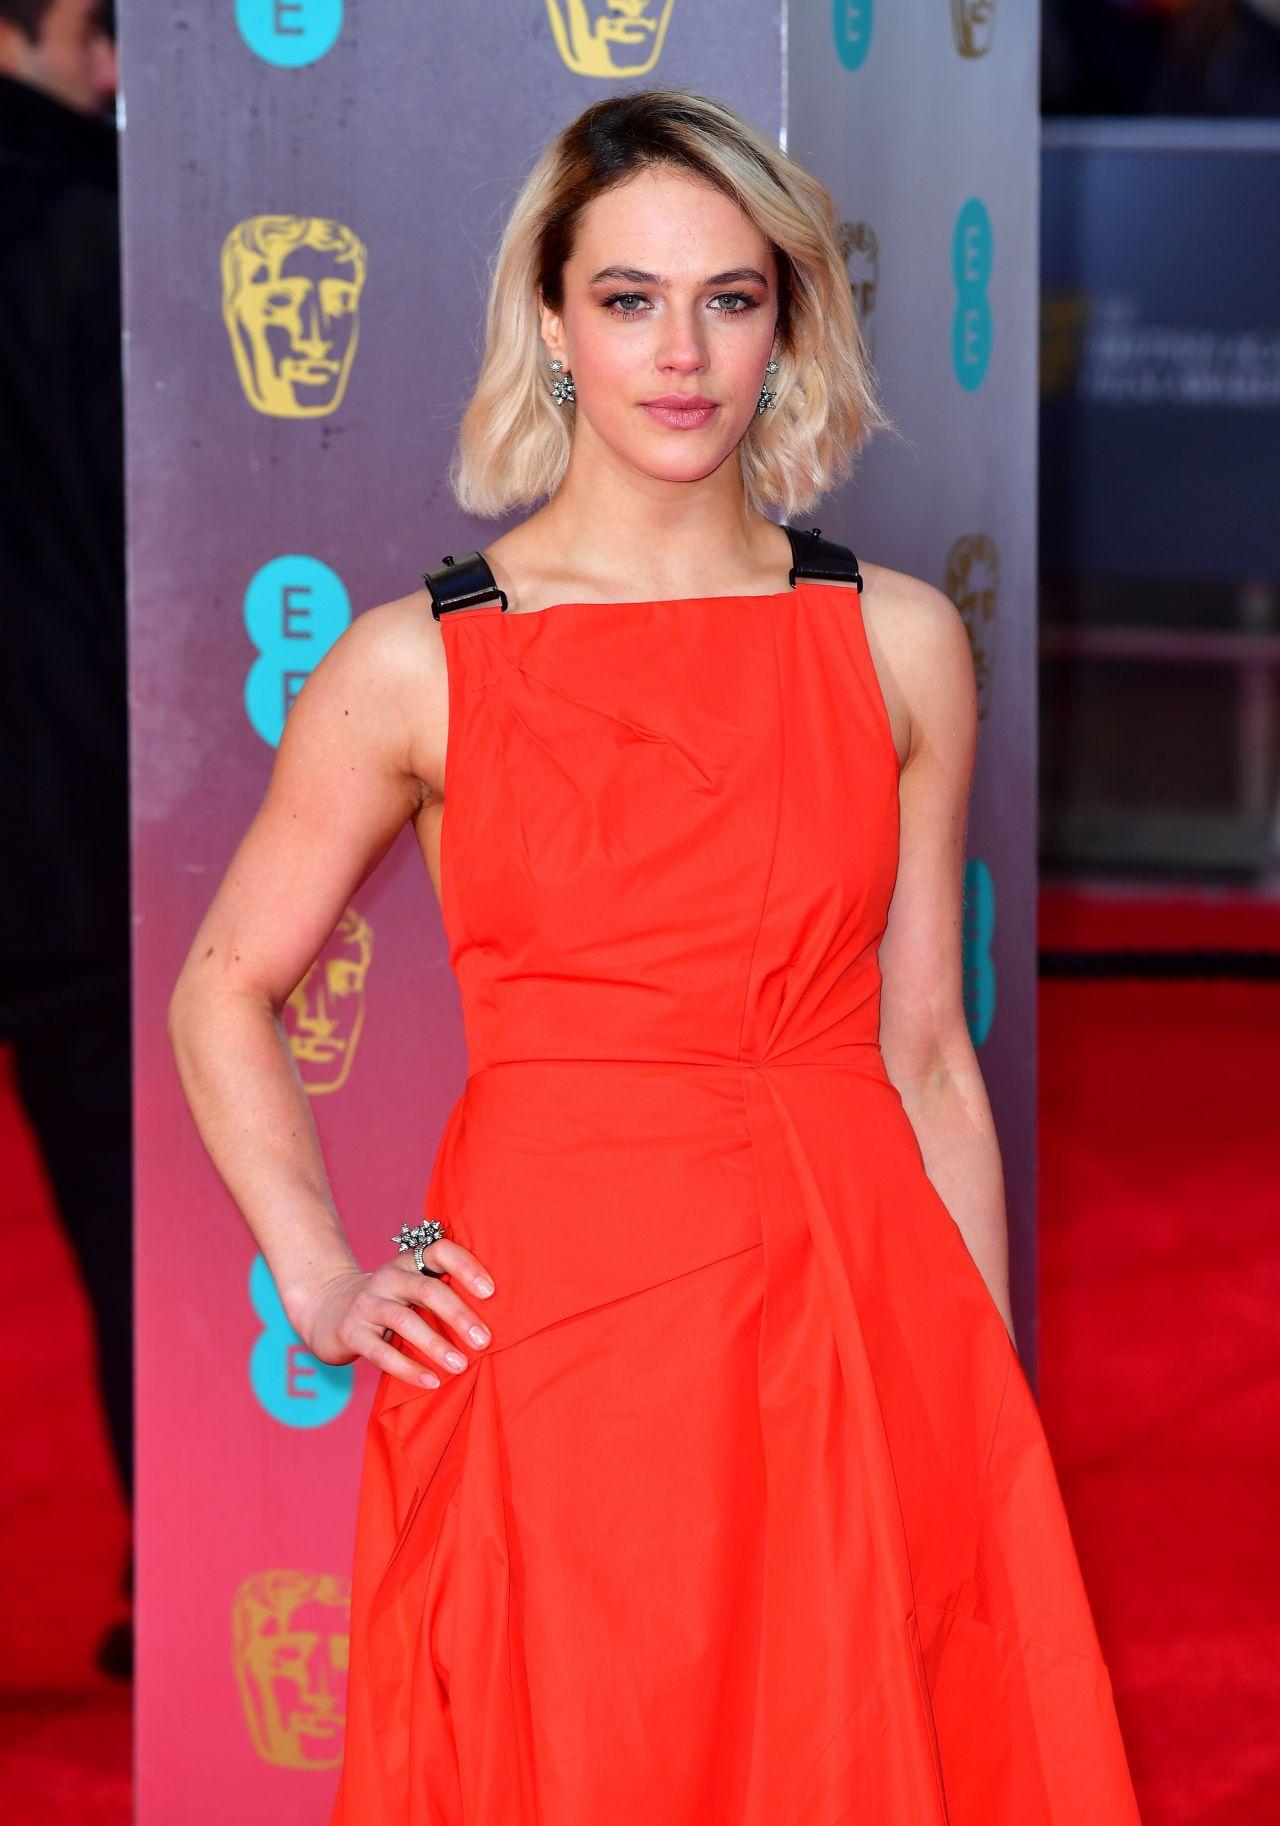 Jessica Brown Findlay - BAFTA Awards at Royal Albert Hall in London, England 2/12/ 2017